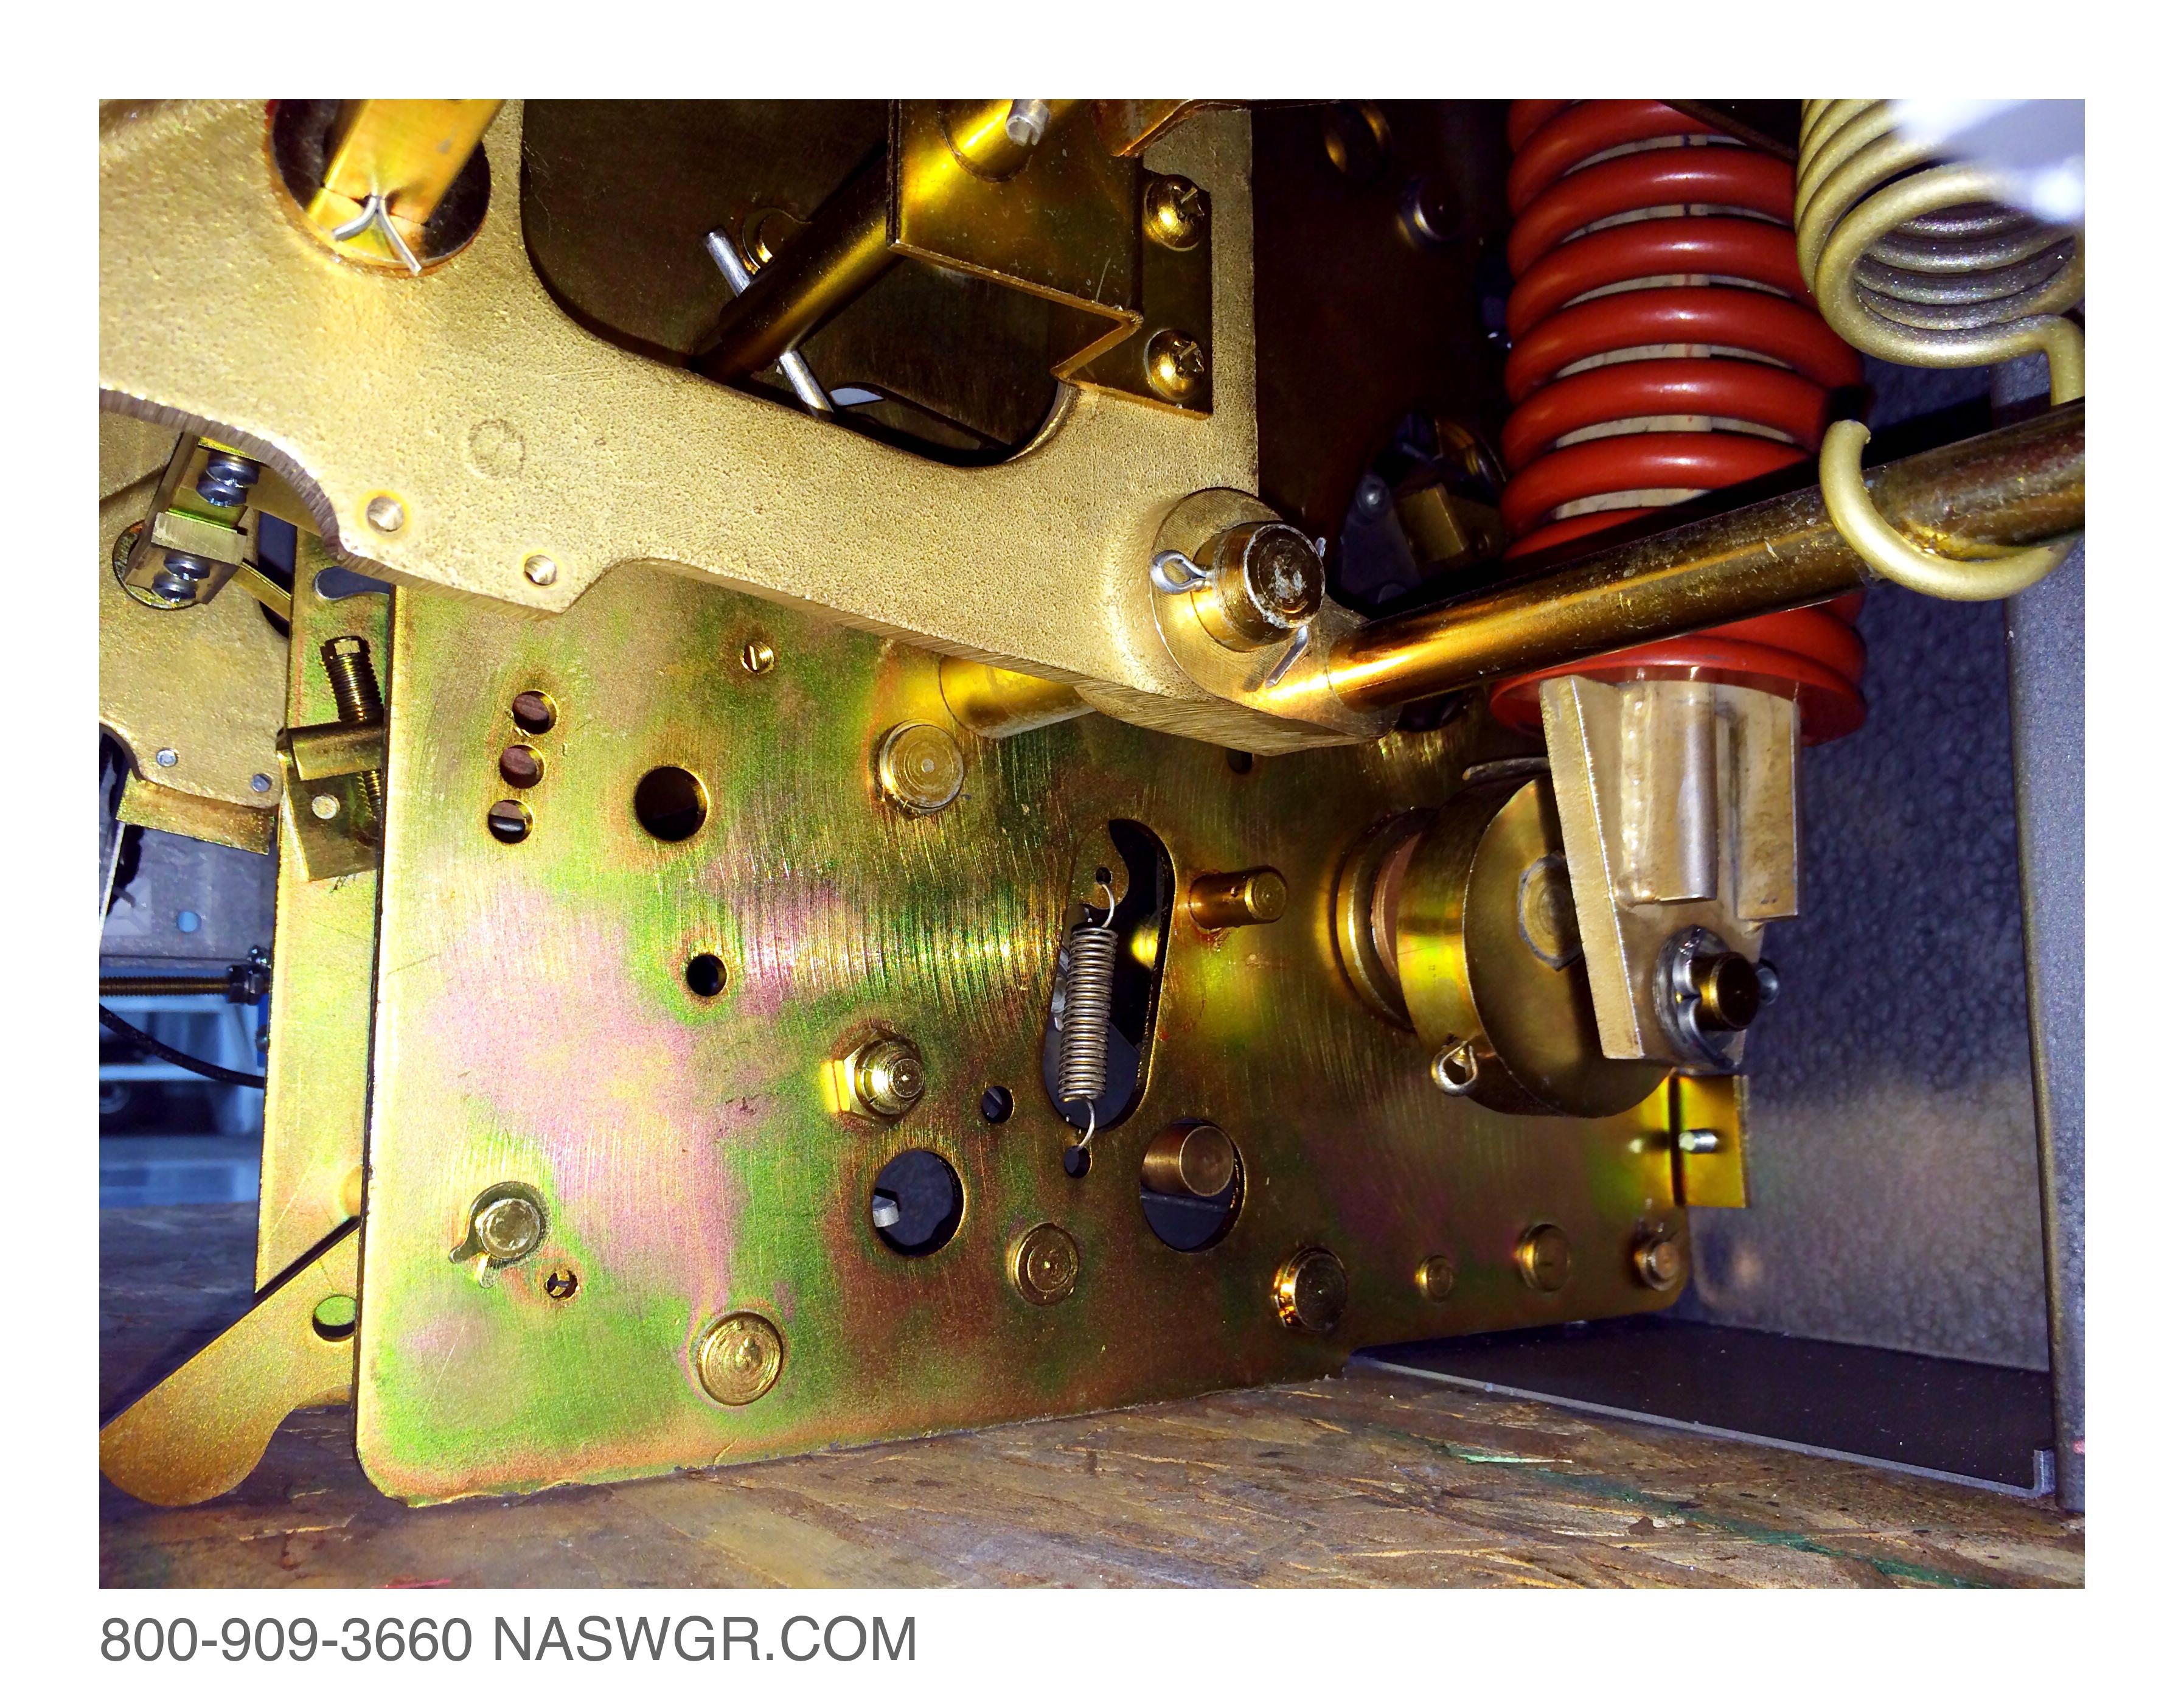 K 4000 Ite K 4000 Circuit Breaker Ite K 4000 Manually